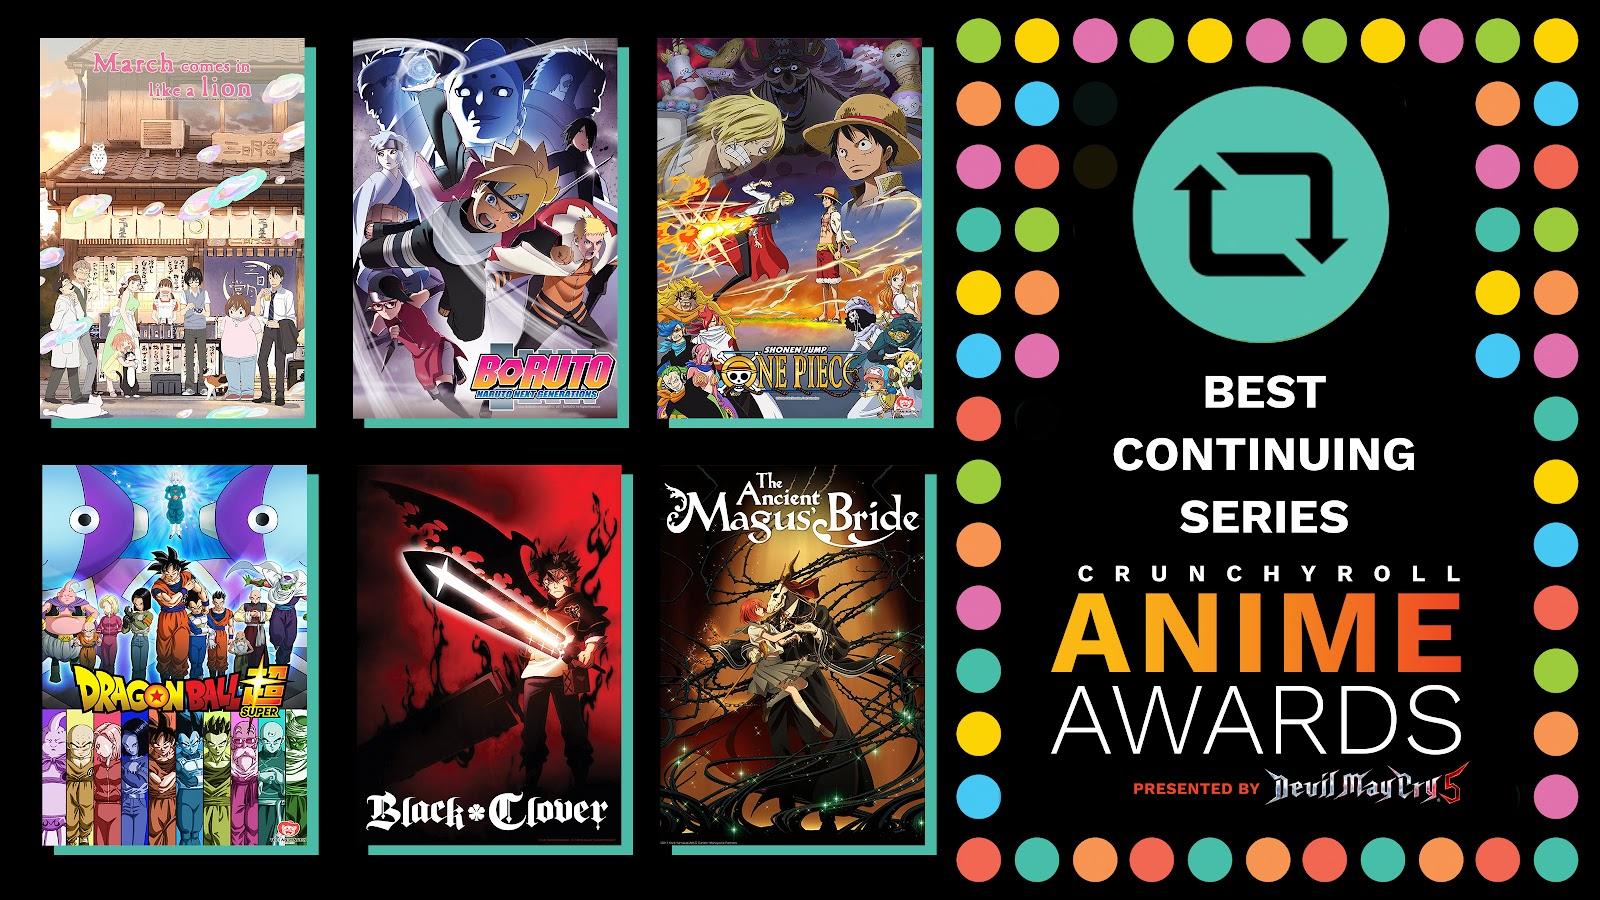 Crunchyroll Meet The Nominees For The 2018 Anime Awards